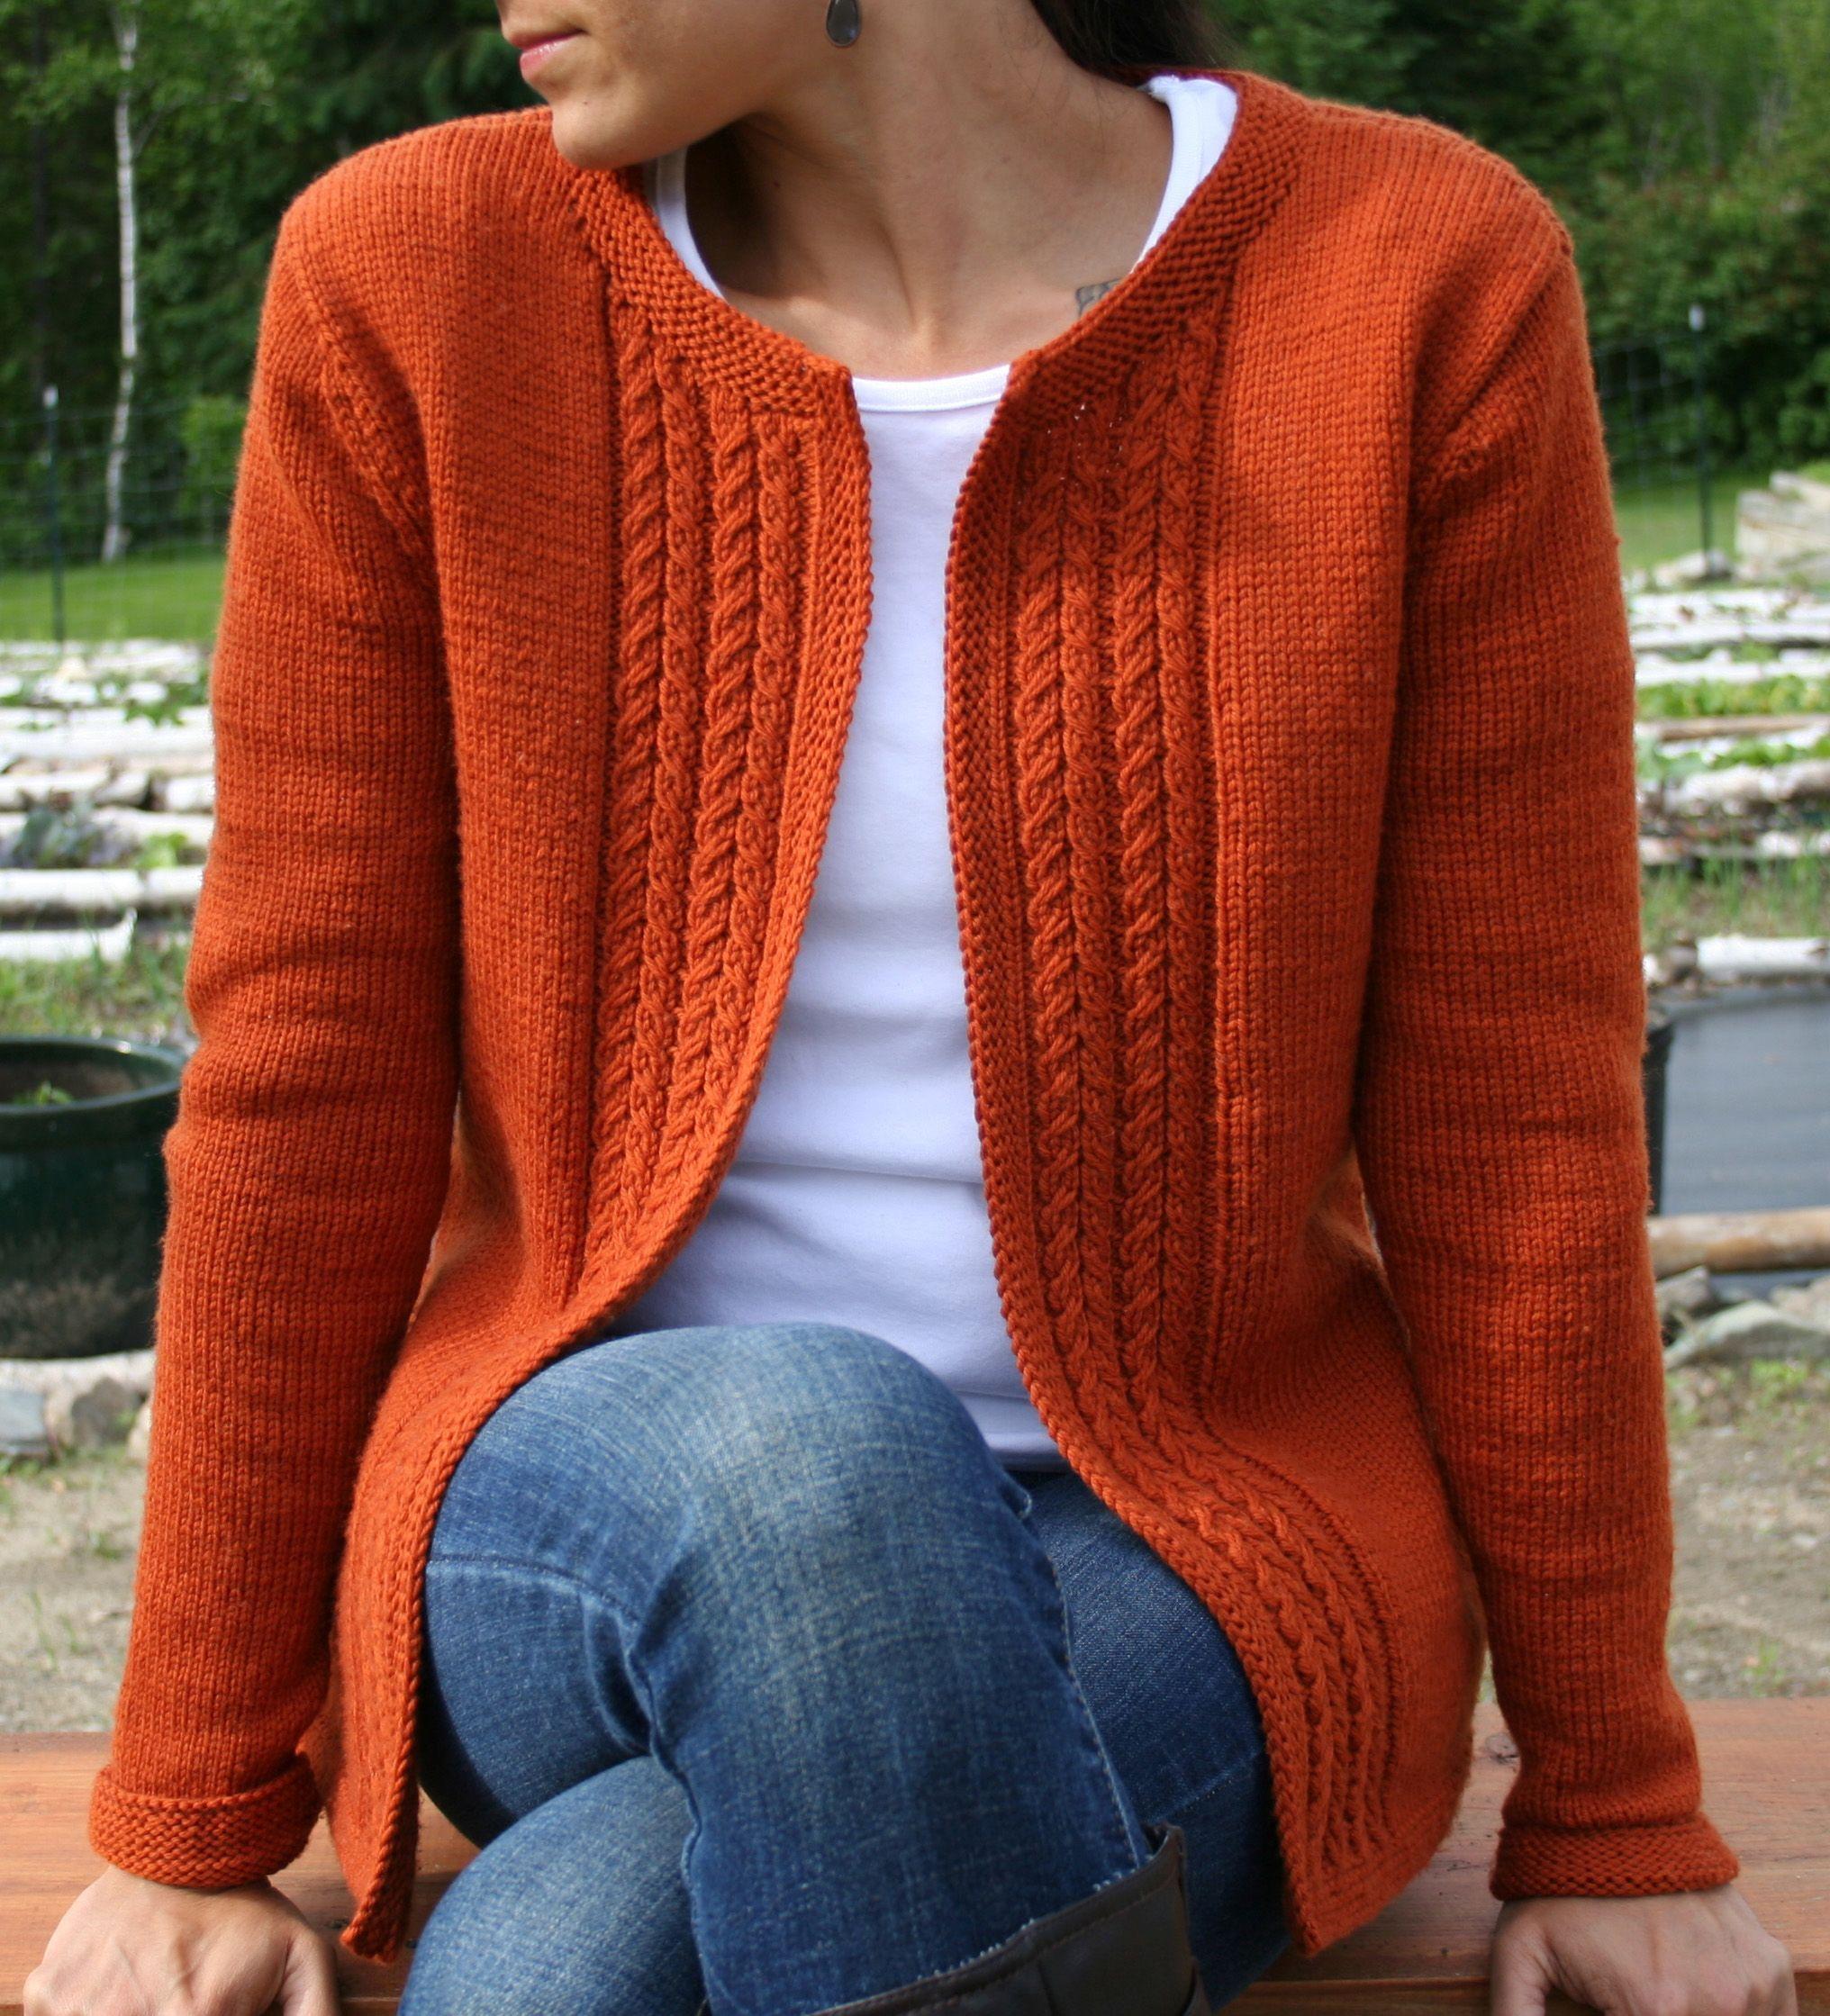 Casual Cardigan Pattern - Knitting Patterns and Crochet ...